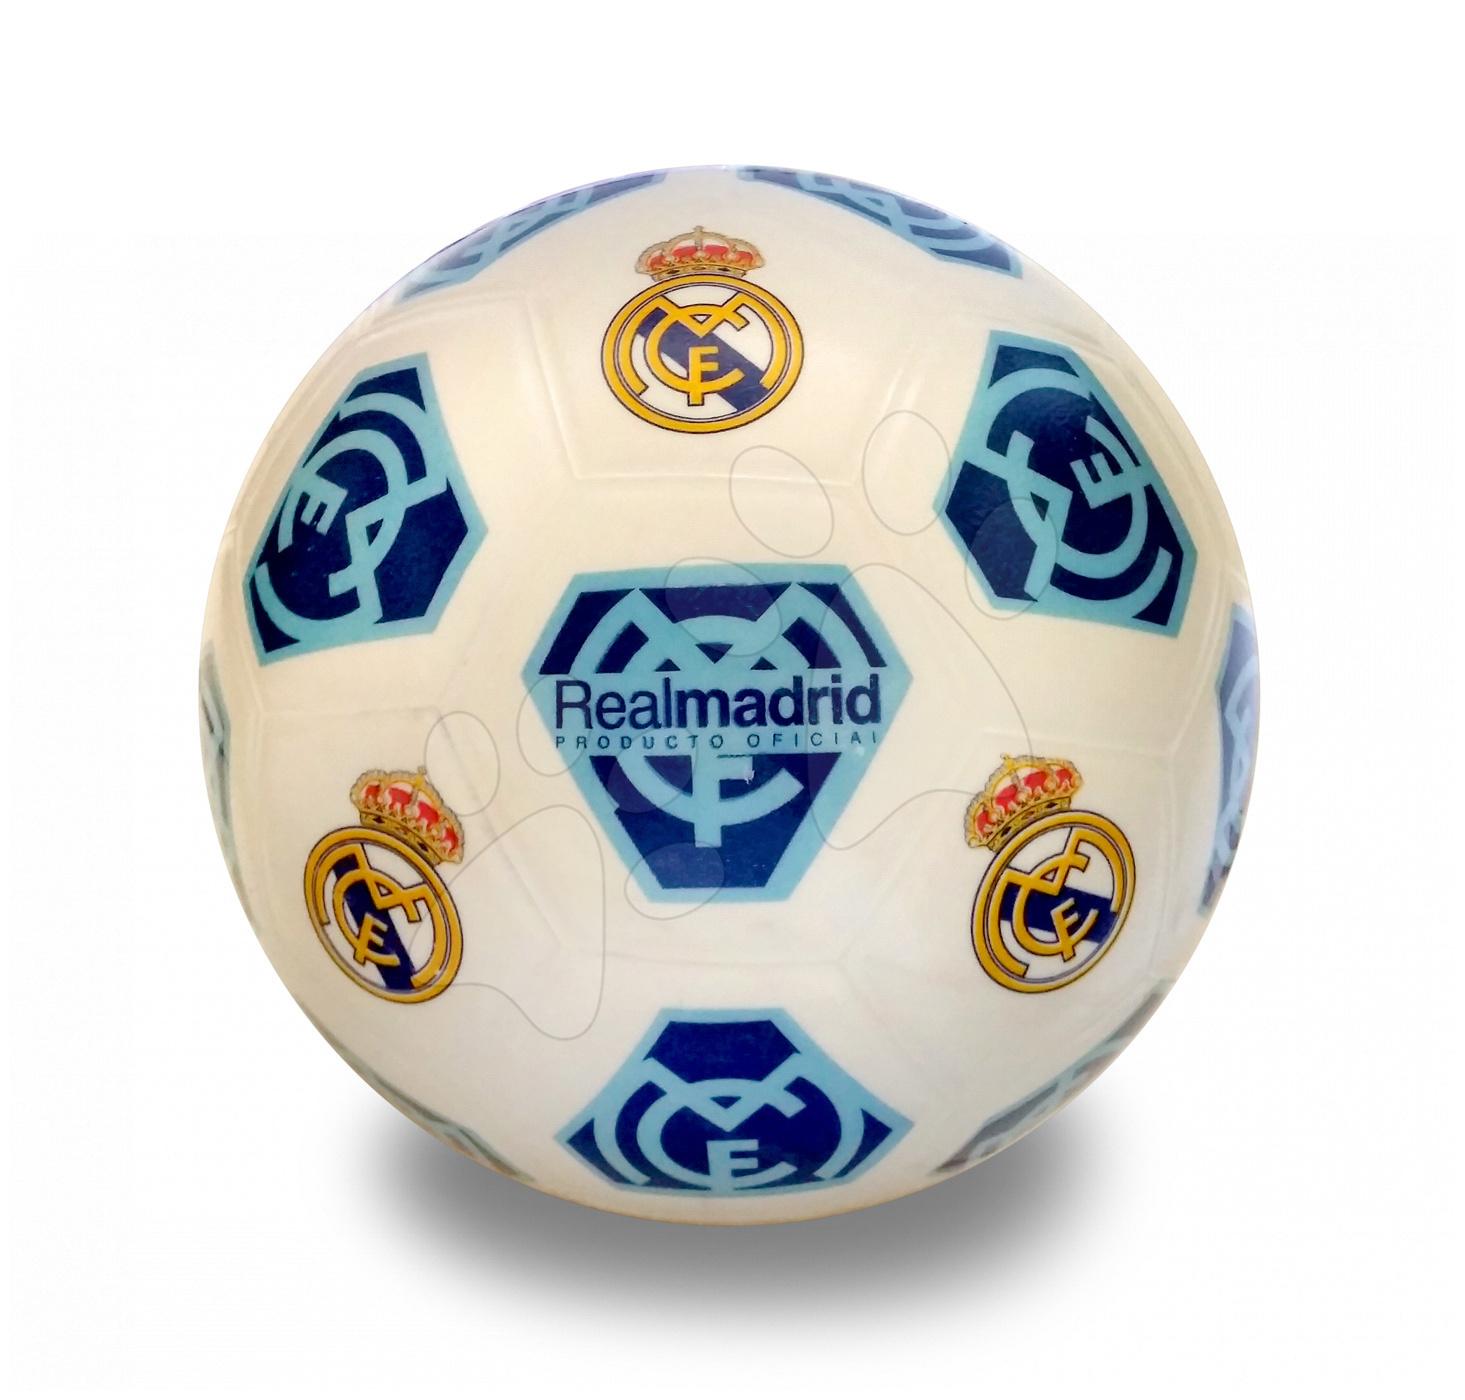 Mingi sport - Minge de fotbal Real Madrid Unice 22 cm cauciuc gros